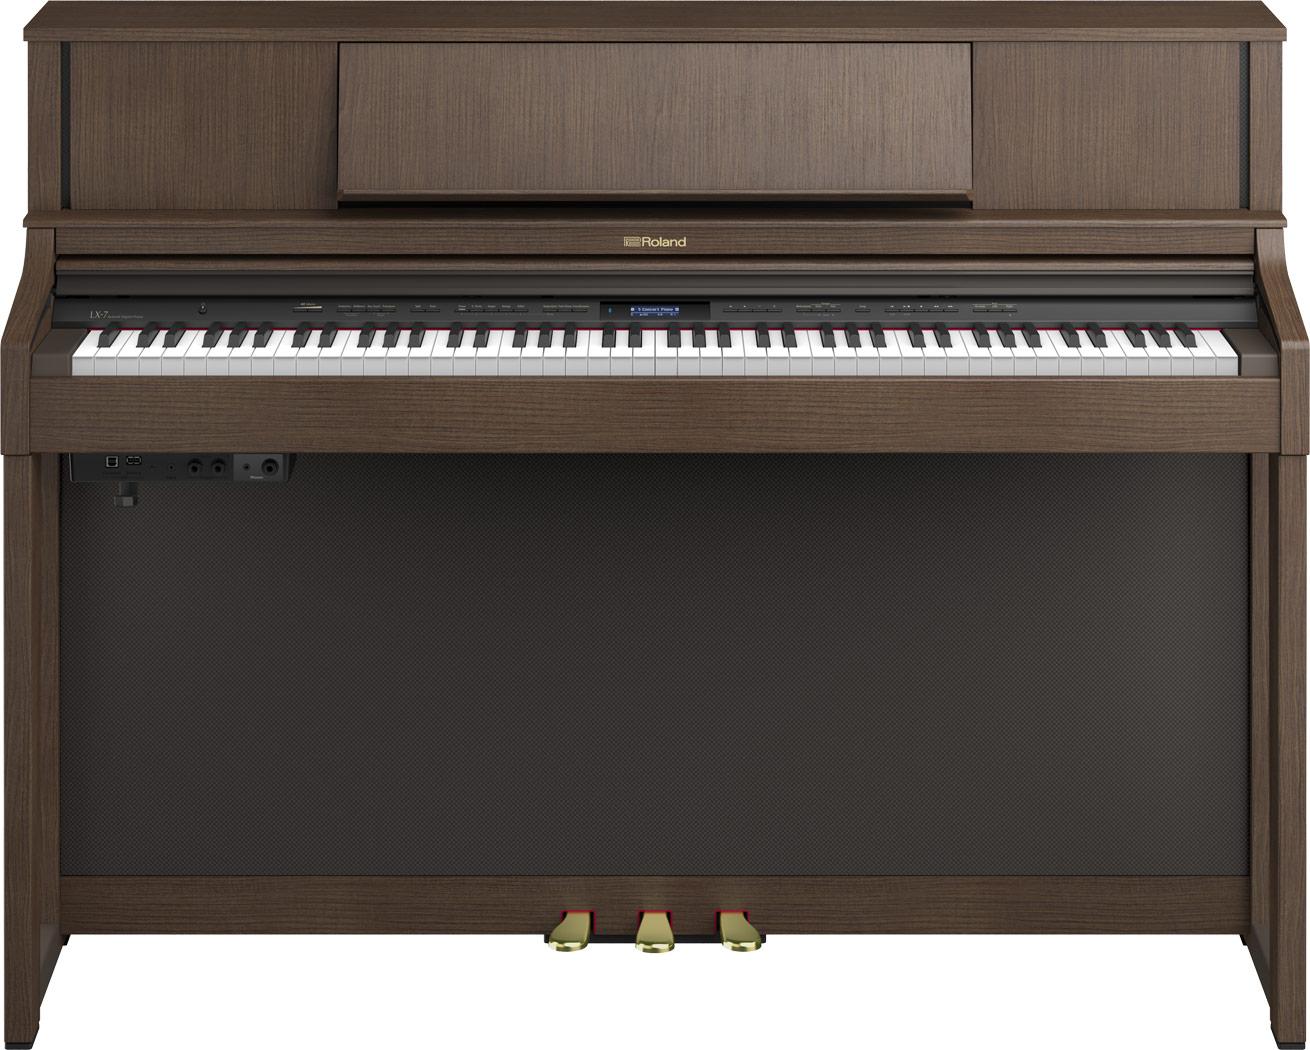 roland lx 7 digital piano. Black Bedroom Furniture Sets. Home Design Ideas